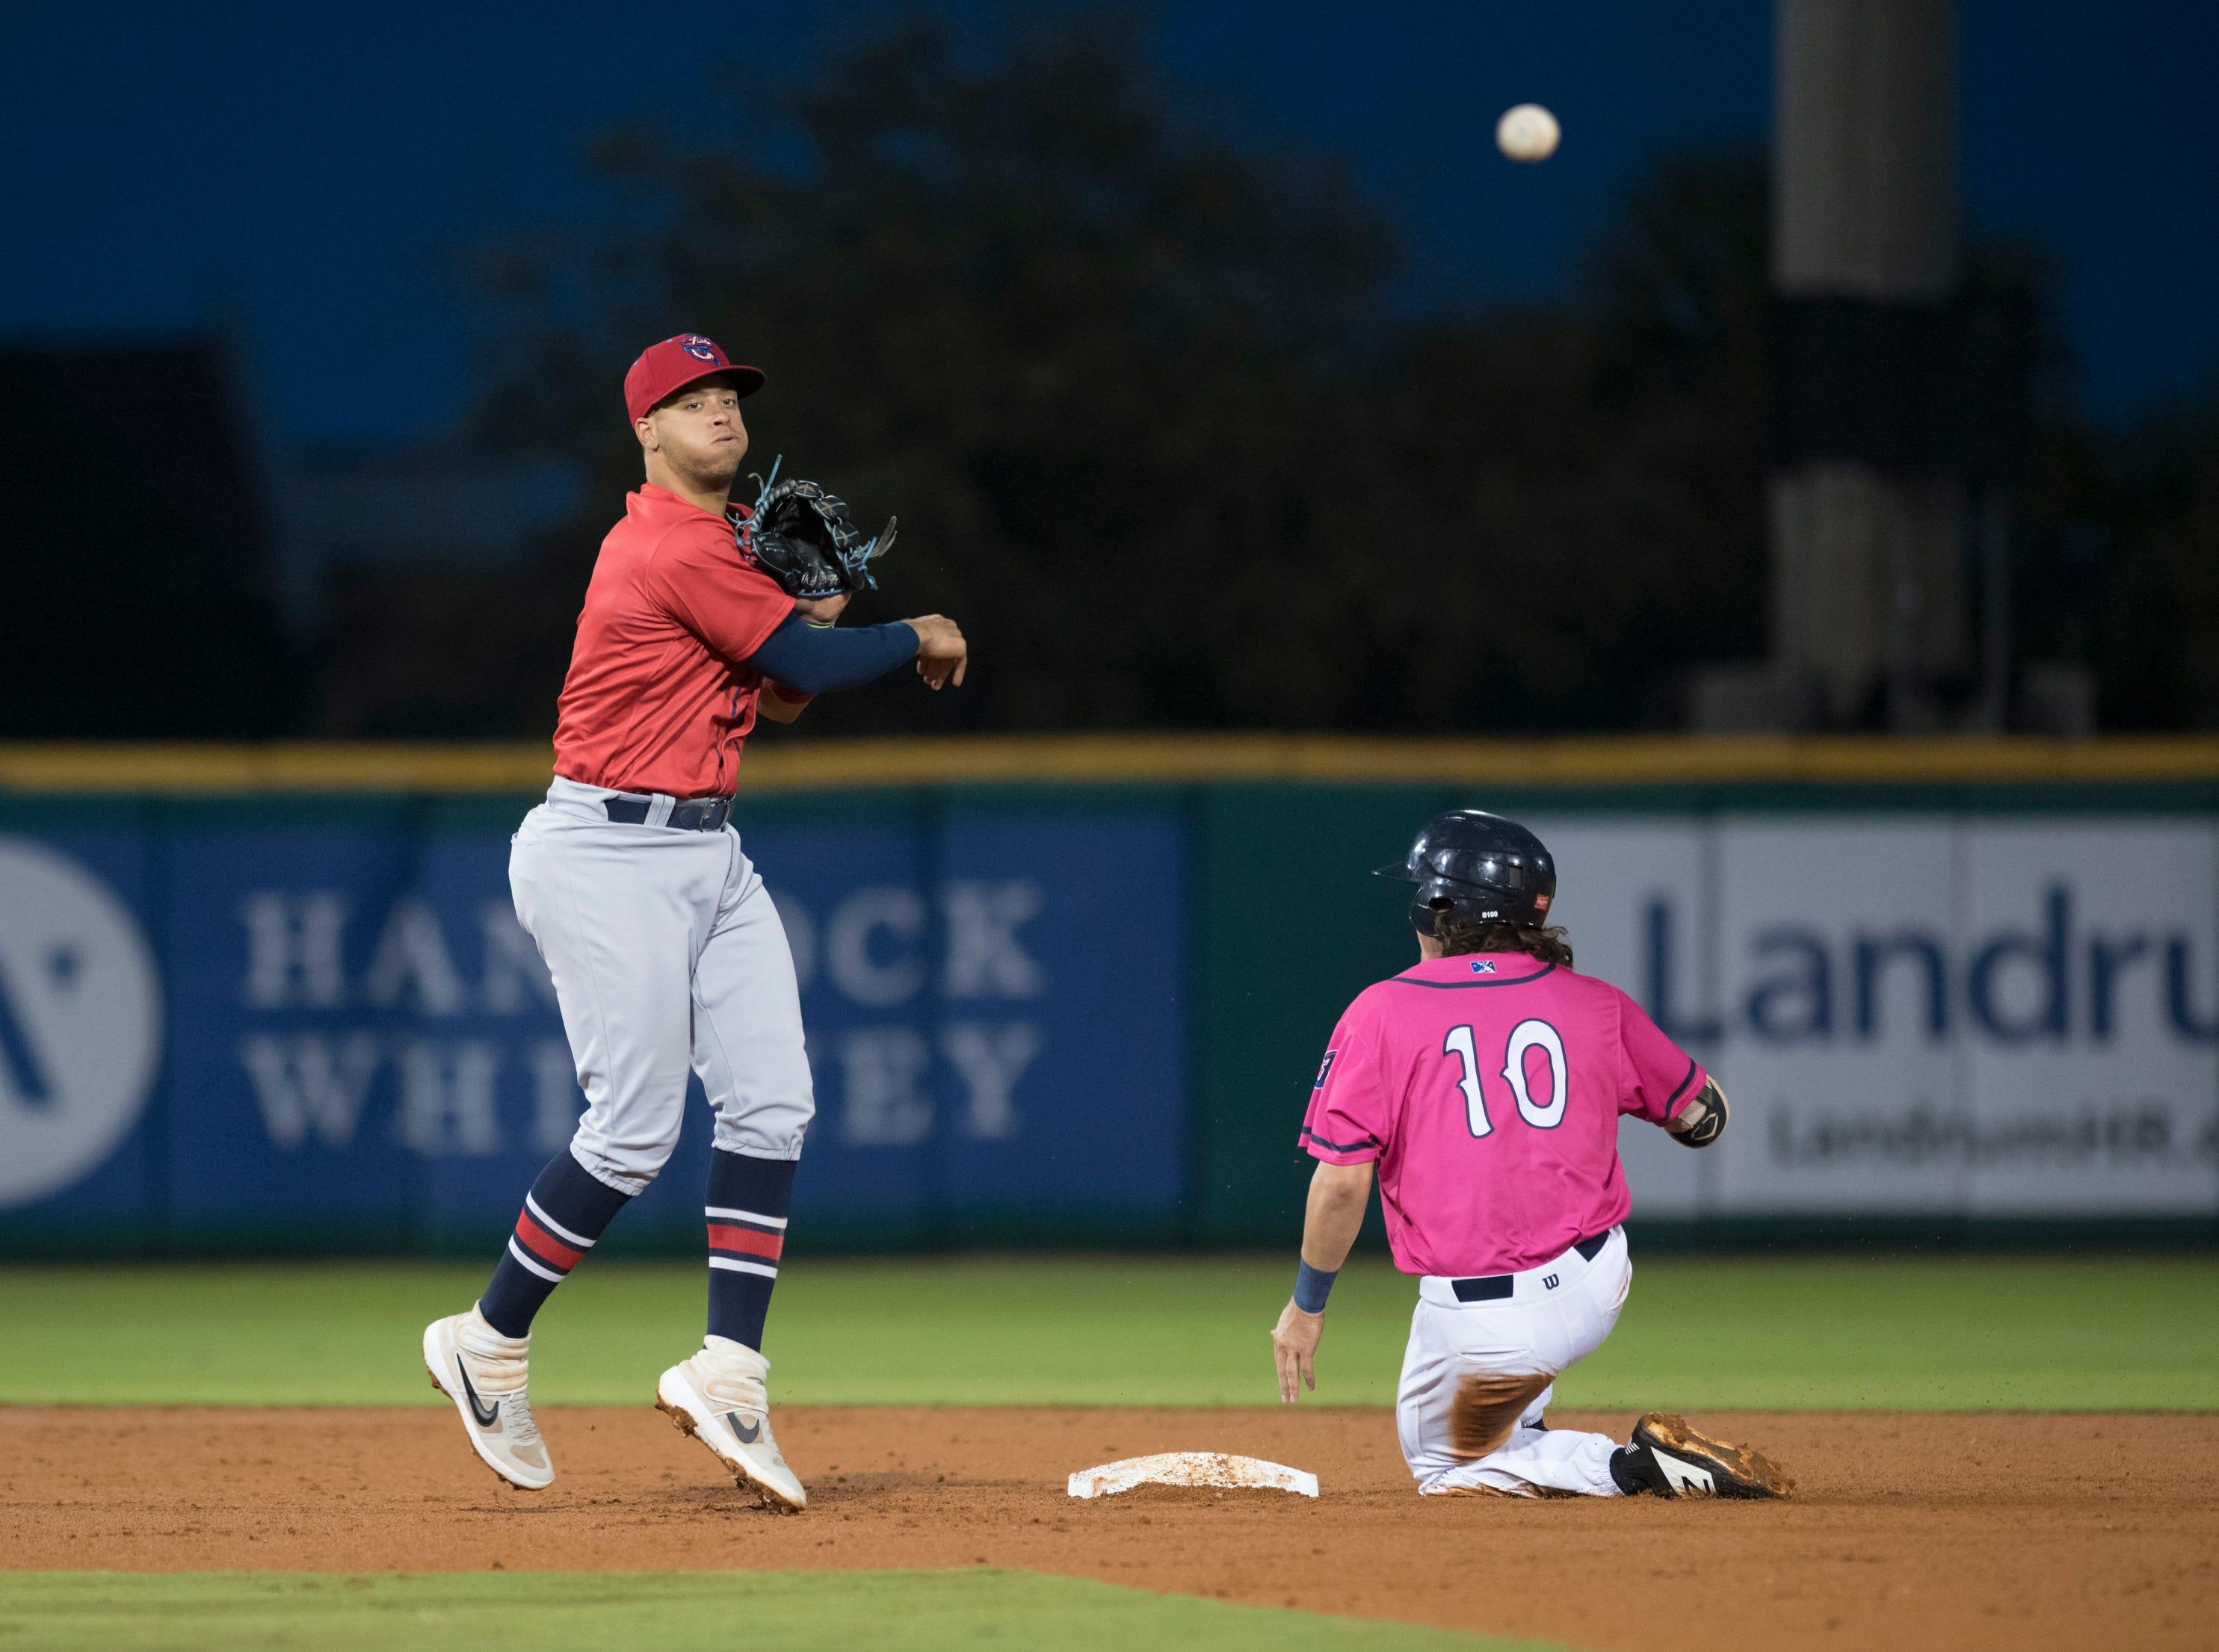 Shortstop Joe Dunand (3) turns the double play during the Jacksonville Jumbo Shrimp vs Pensacola Blue Wahoos baseball game in Pensacola on Friday, April 12, 2019.